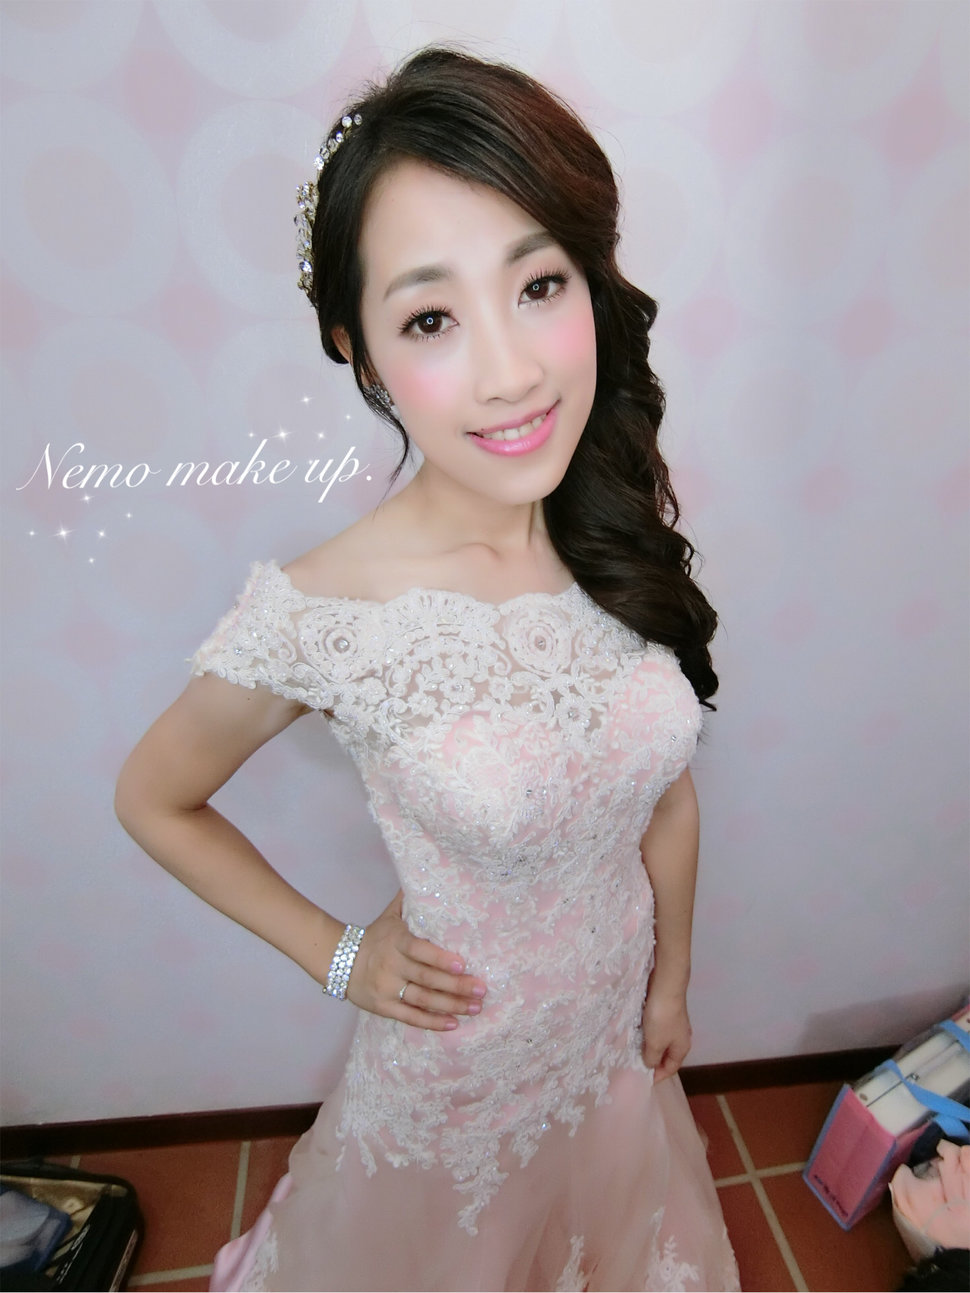 IMG_7815 - 新竹🎀Nemo新娘秘書服務🎀 - 結婚吧